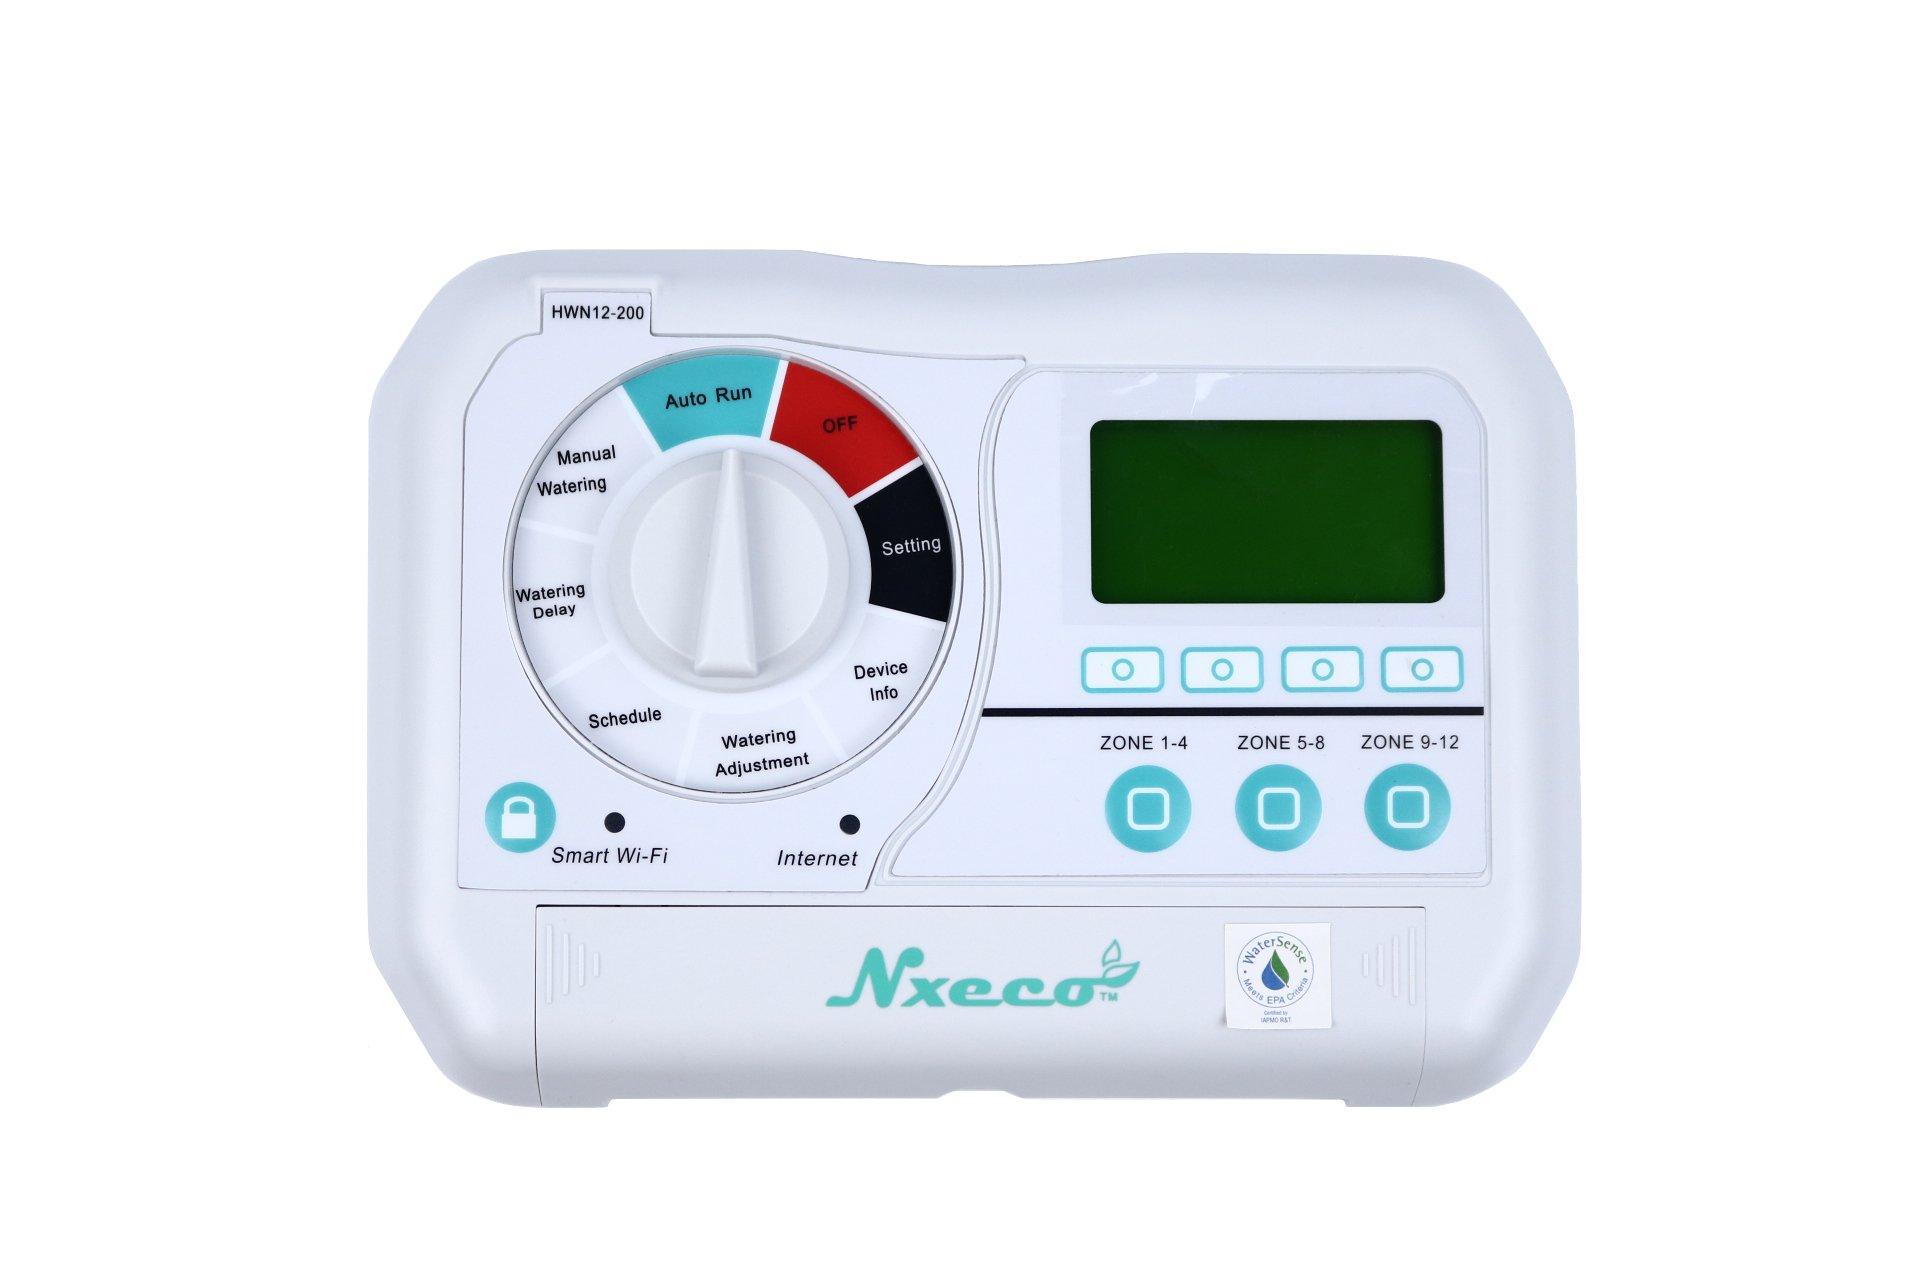 Nxeco NX8 Smart Irrigation Controller - Works with Amazon Alexa